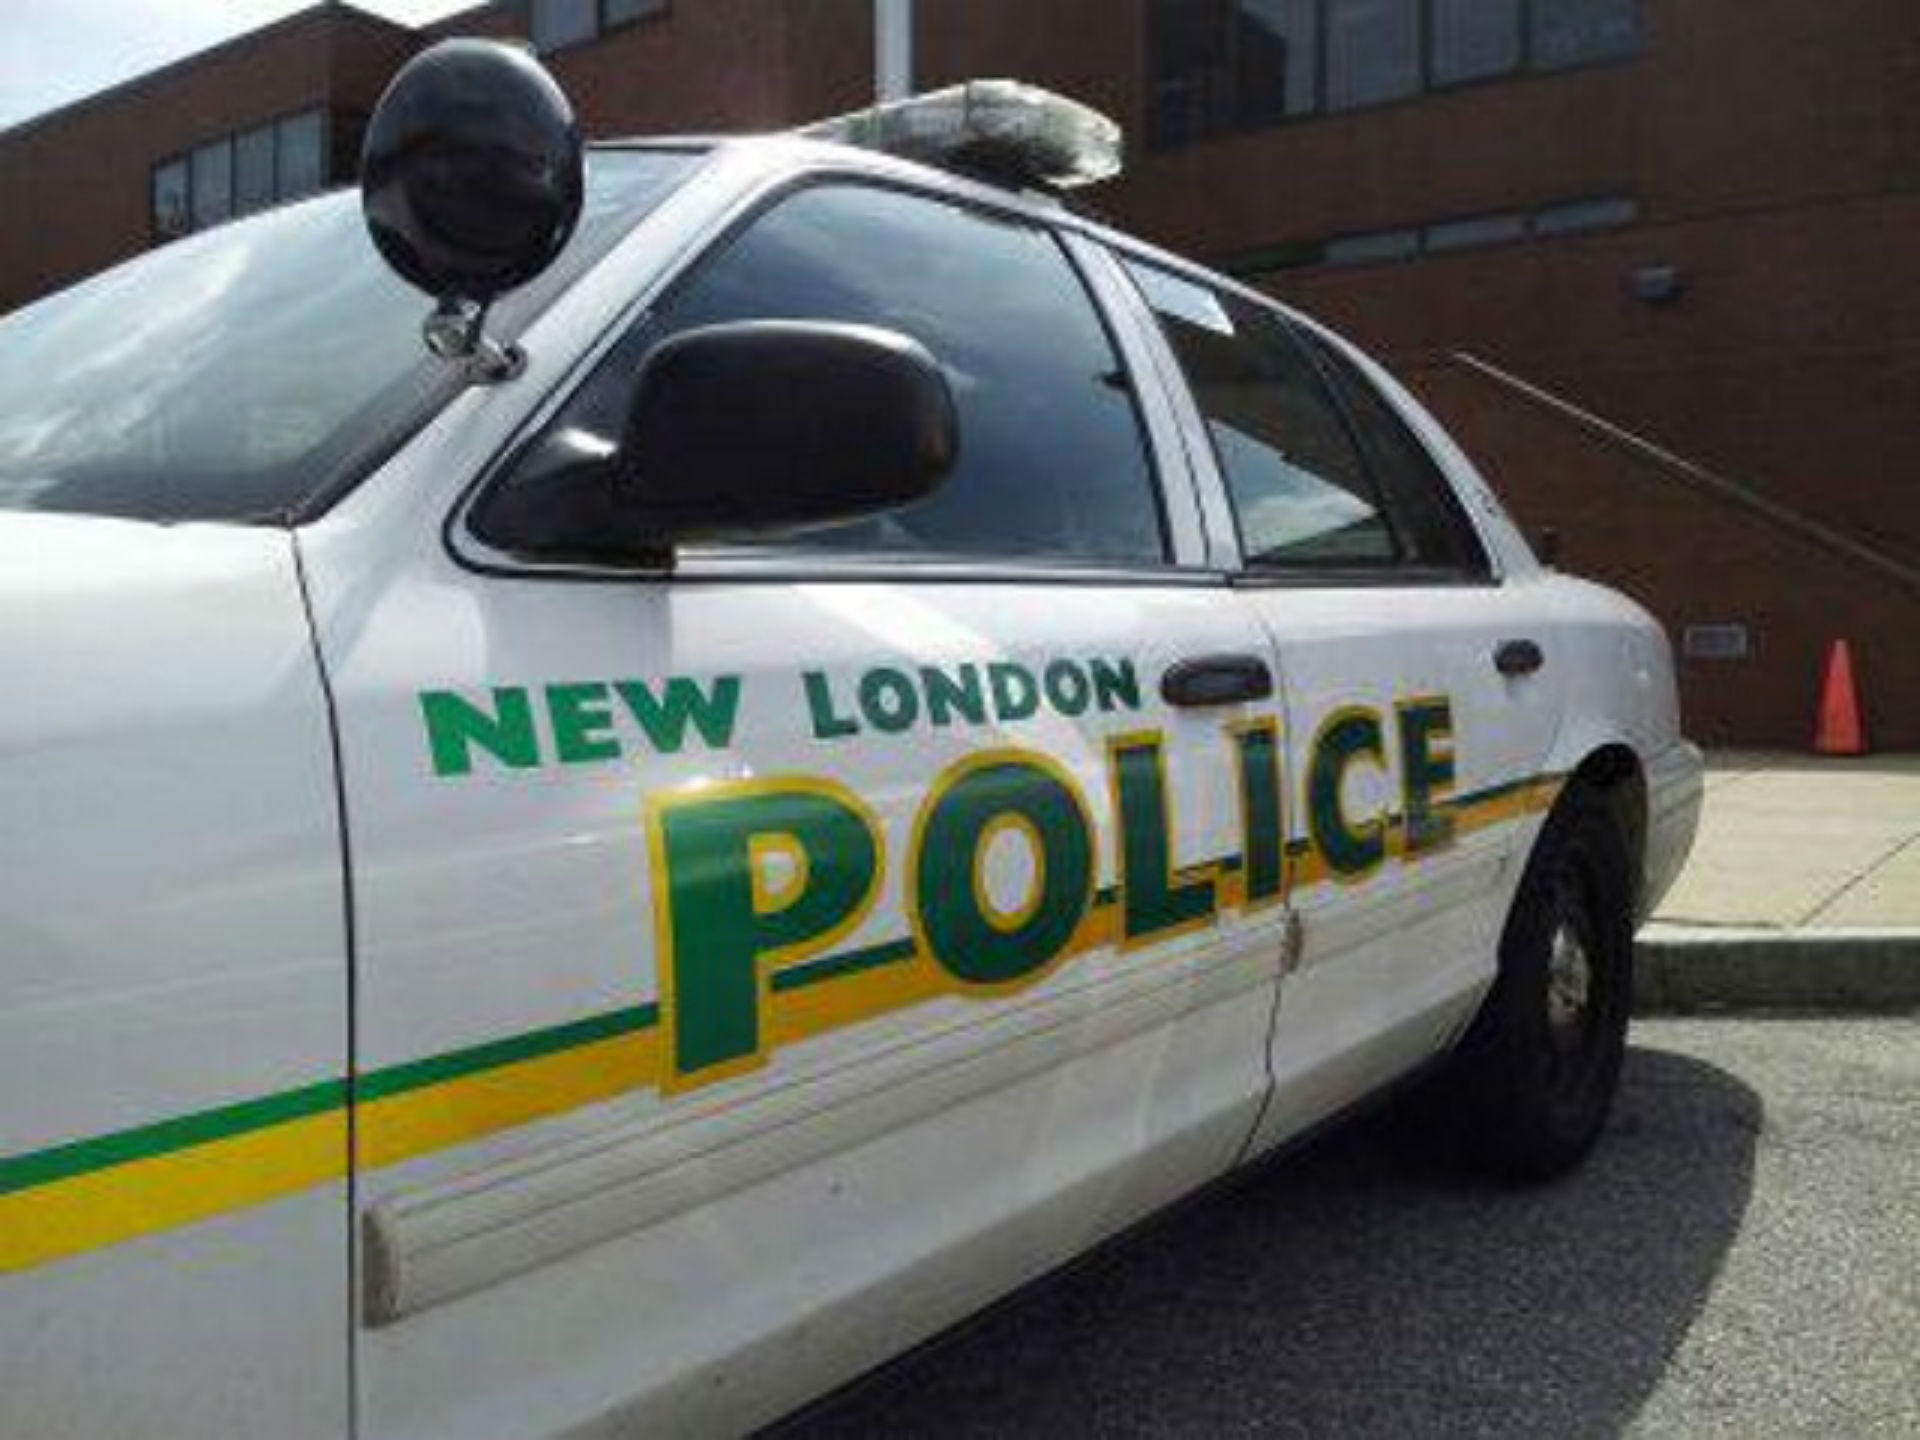 New London Police_1522666389754.jpg.jpg